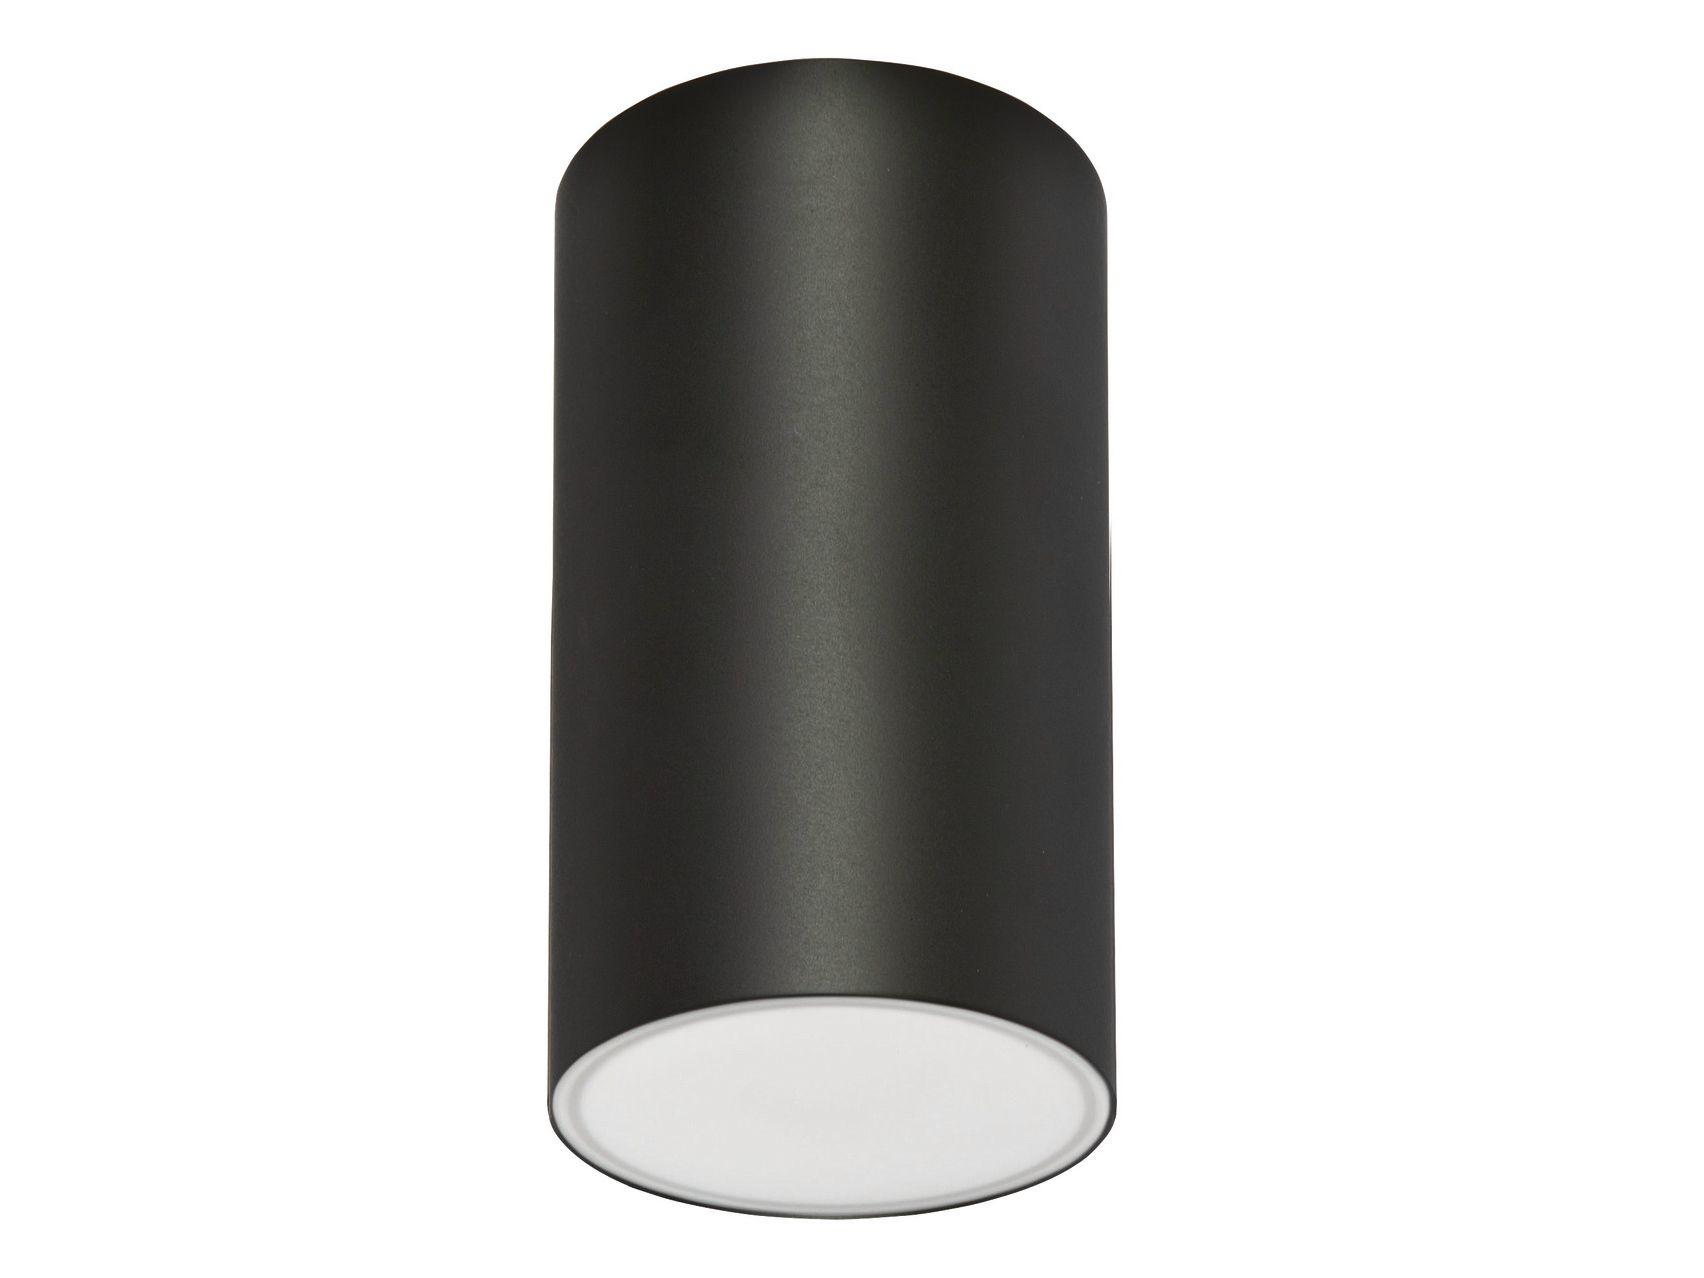 Ceiling Mounted Led Emergency Lights : Lens ceiling mounted emergency light by daisalux